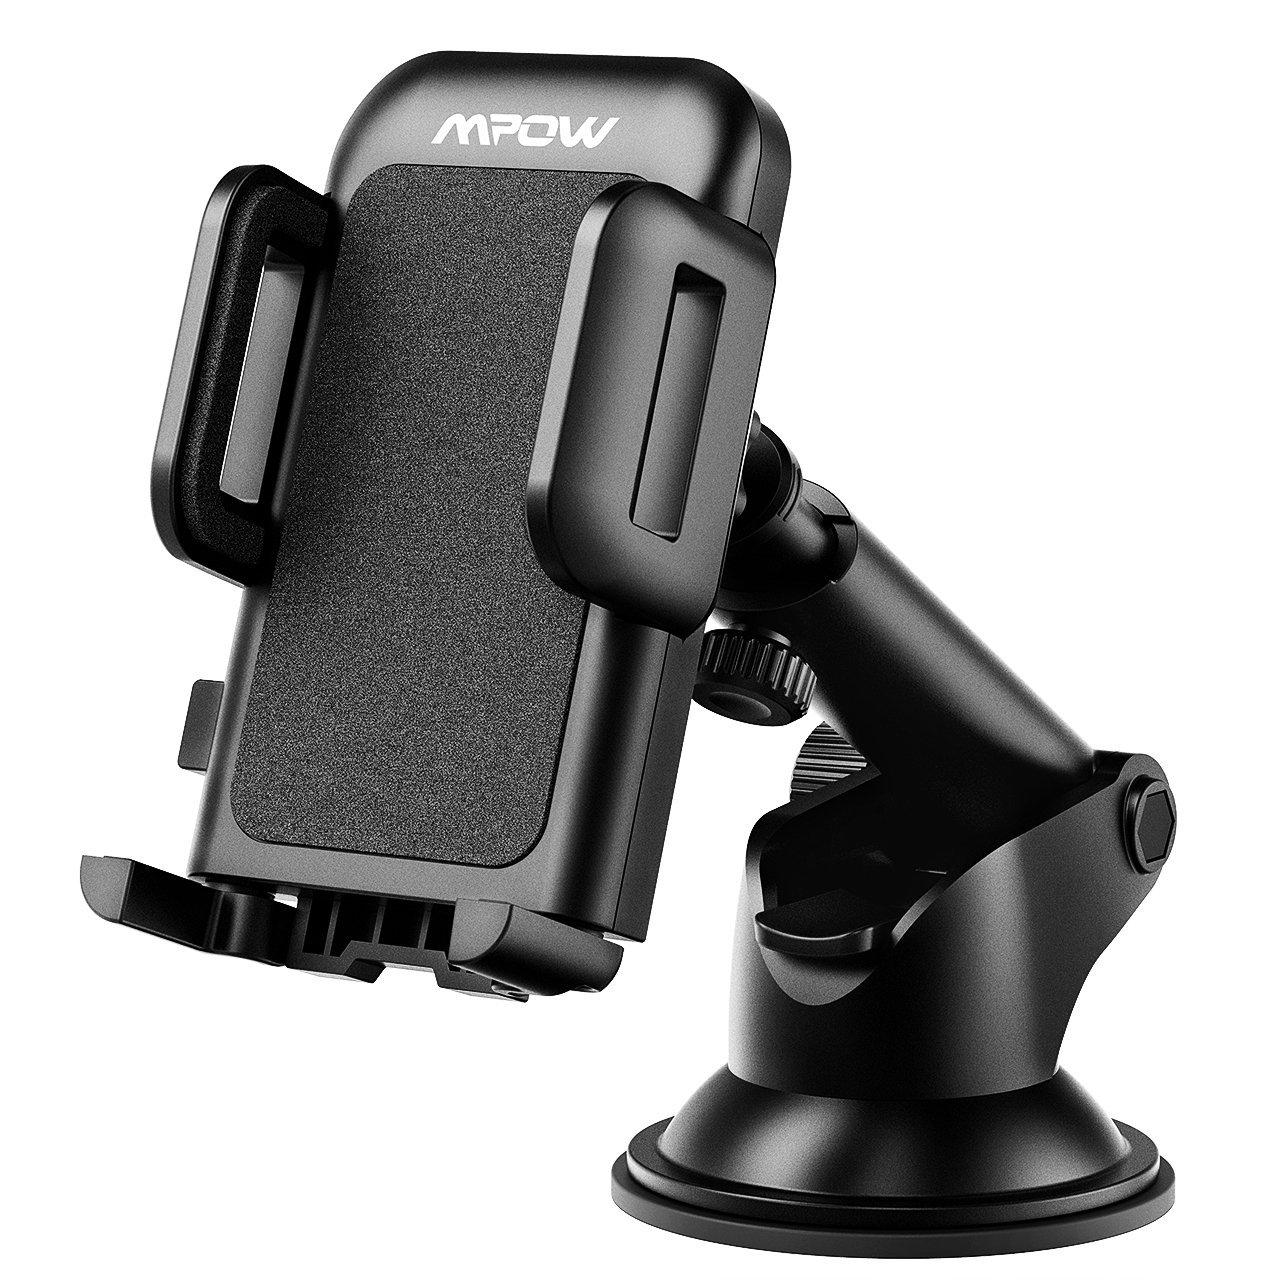 mpow, phone holder, road trip